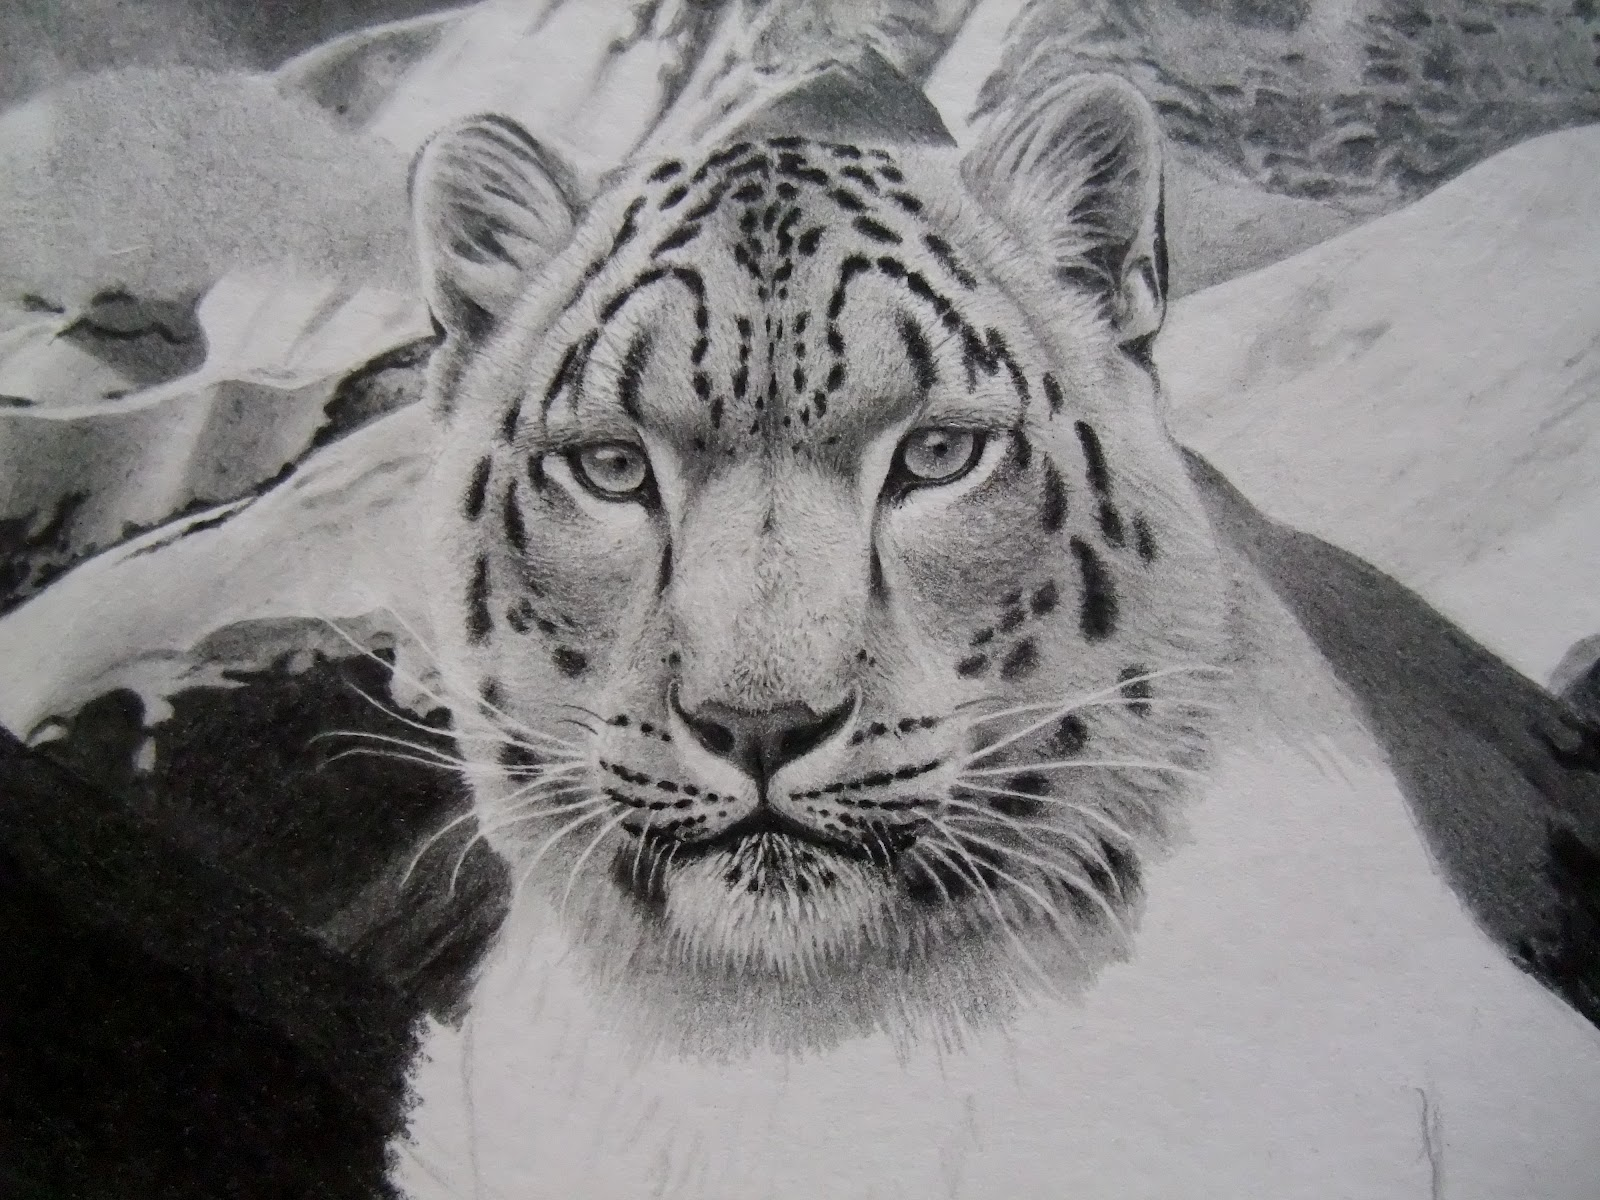 Antoine Roquain Dessin Animalier, Wildlife Pencil Art: avril 2012